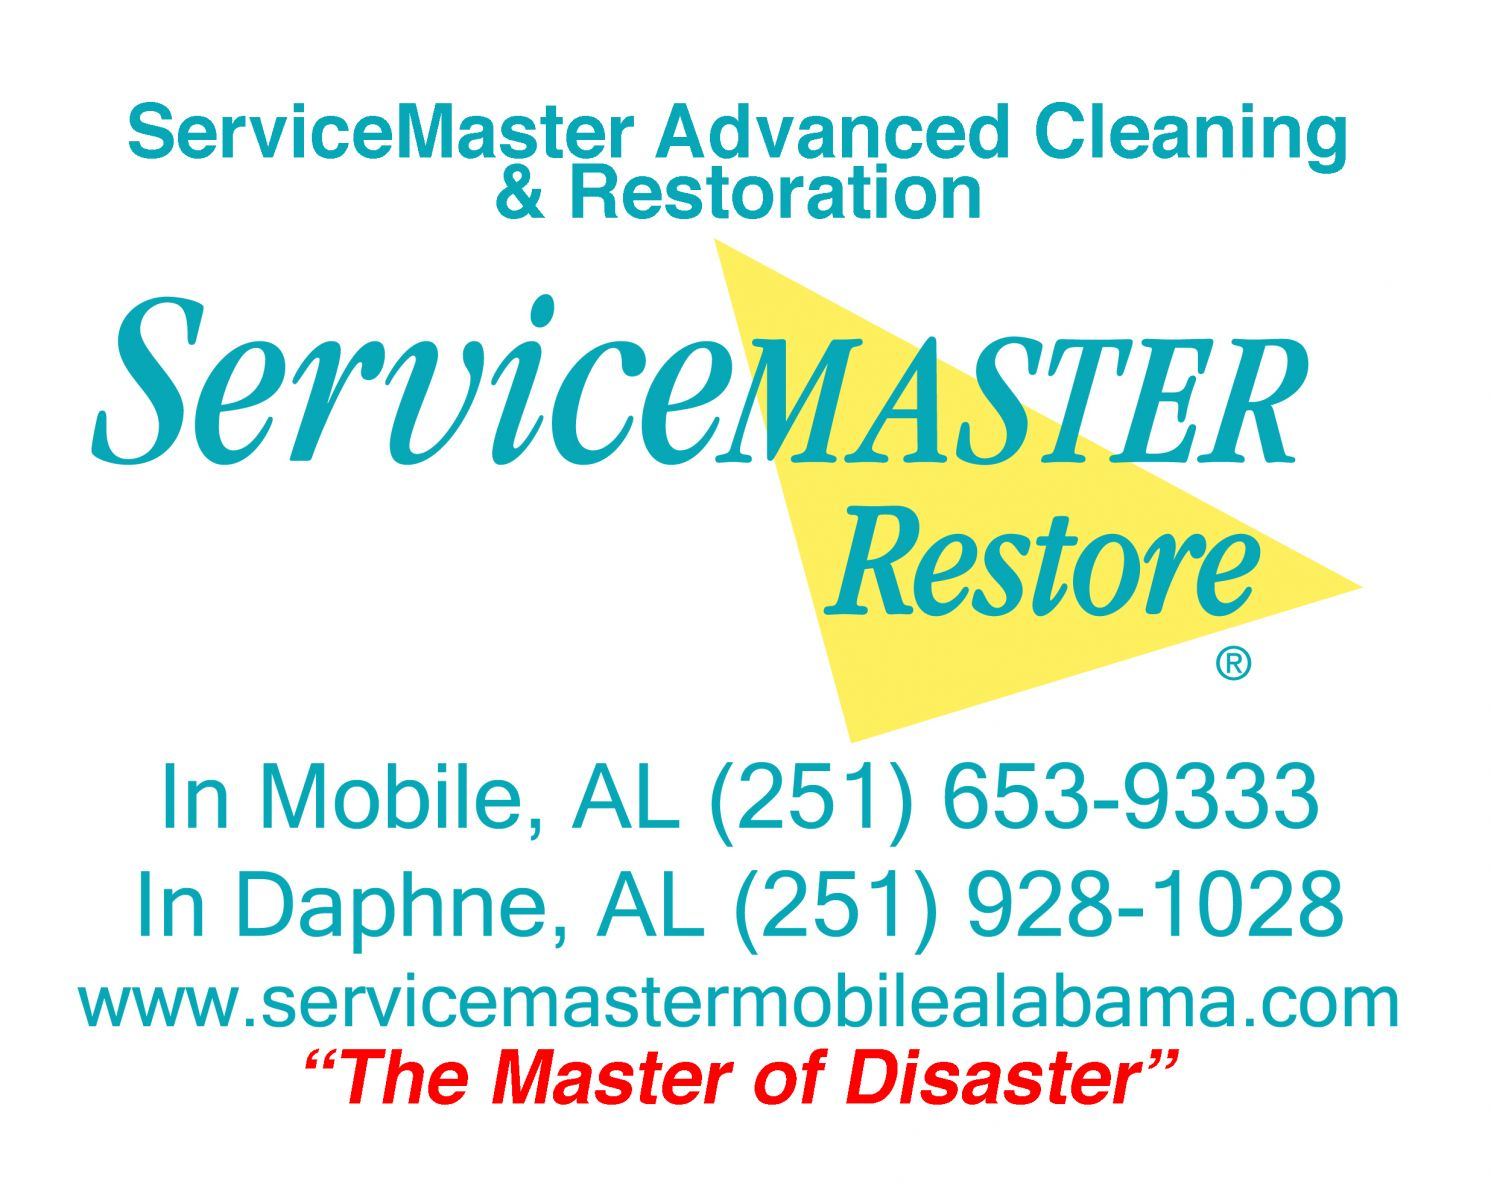 ServiceMaster Advanced Cleaning & Restoration - Daphne, AL - Mold